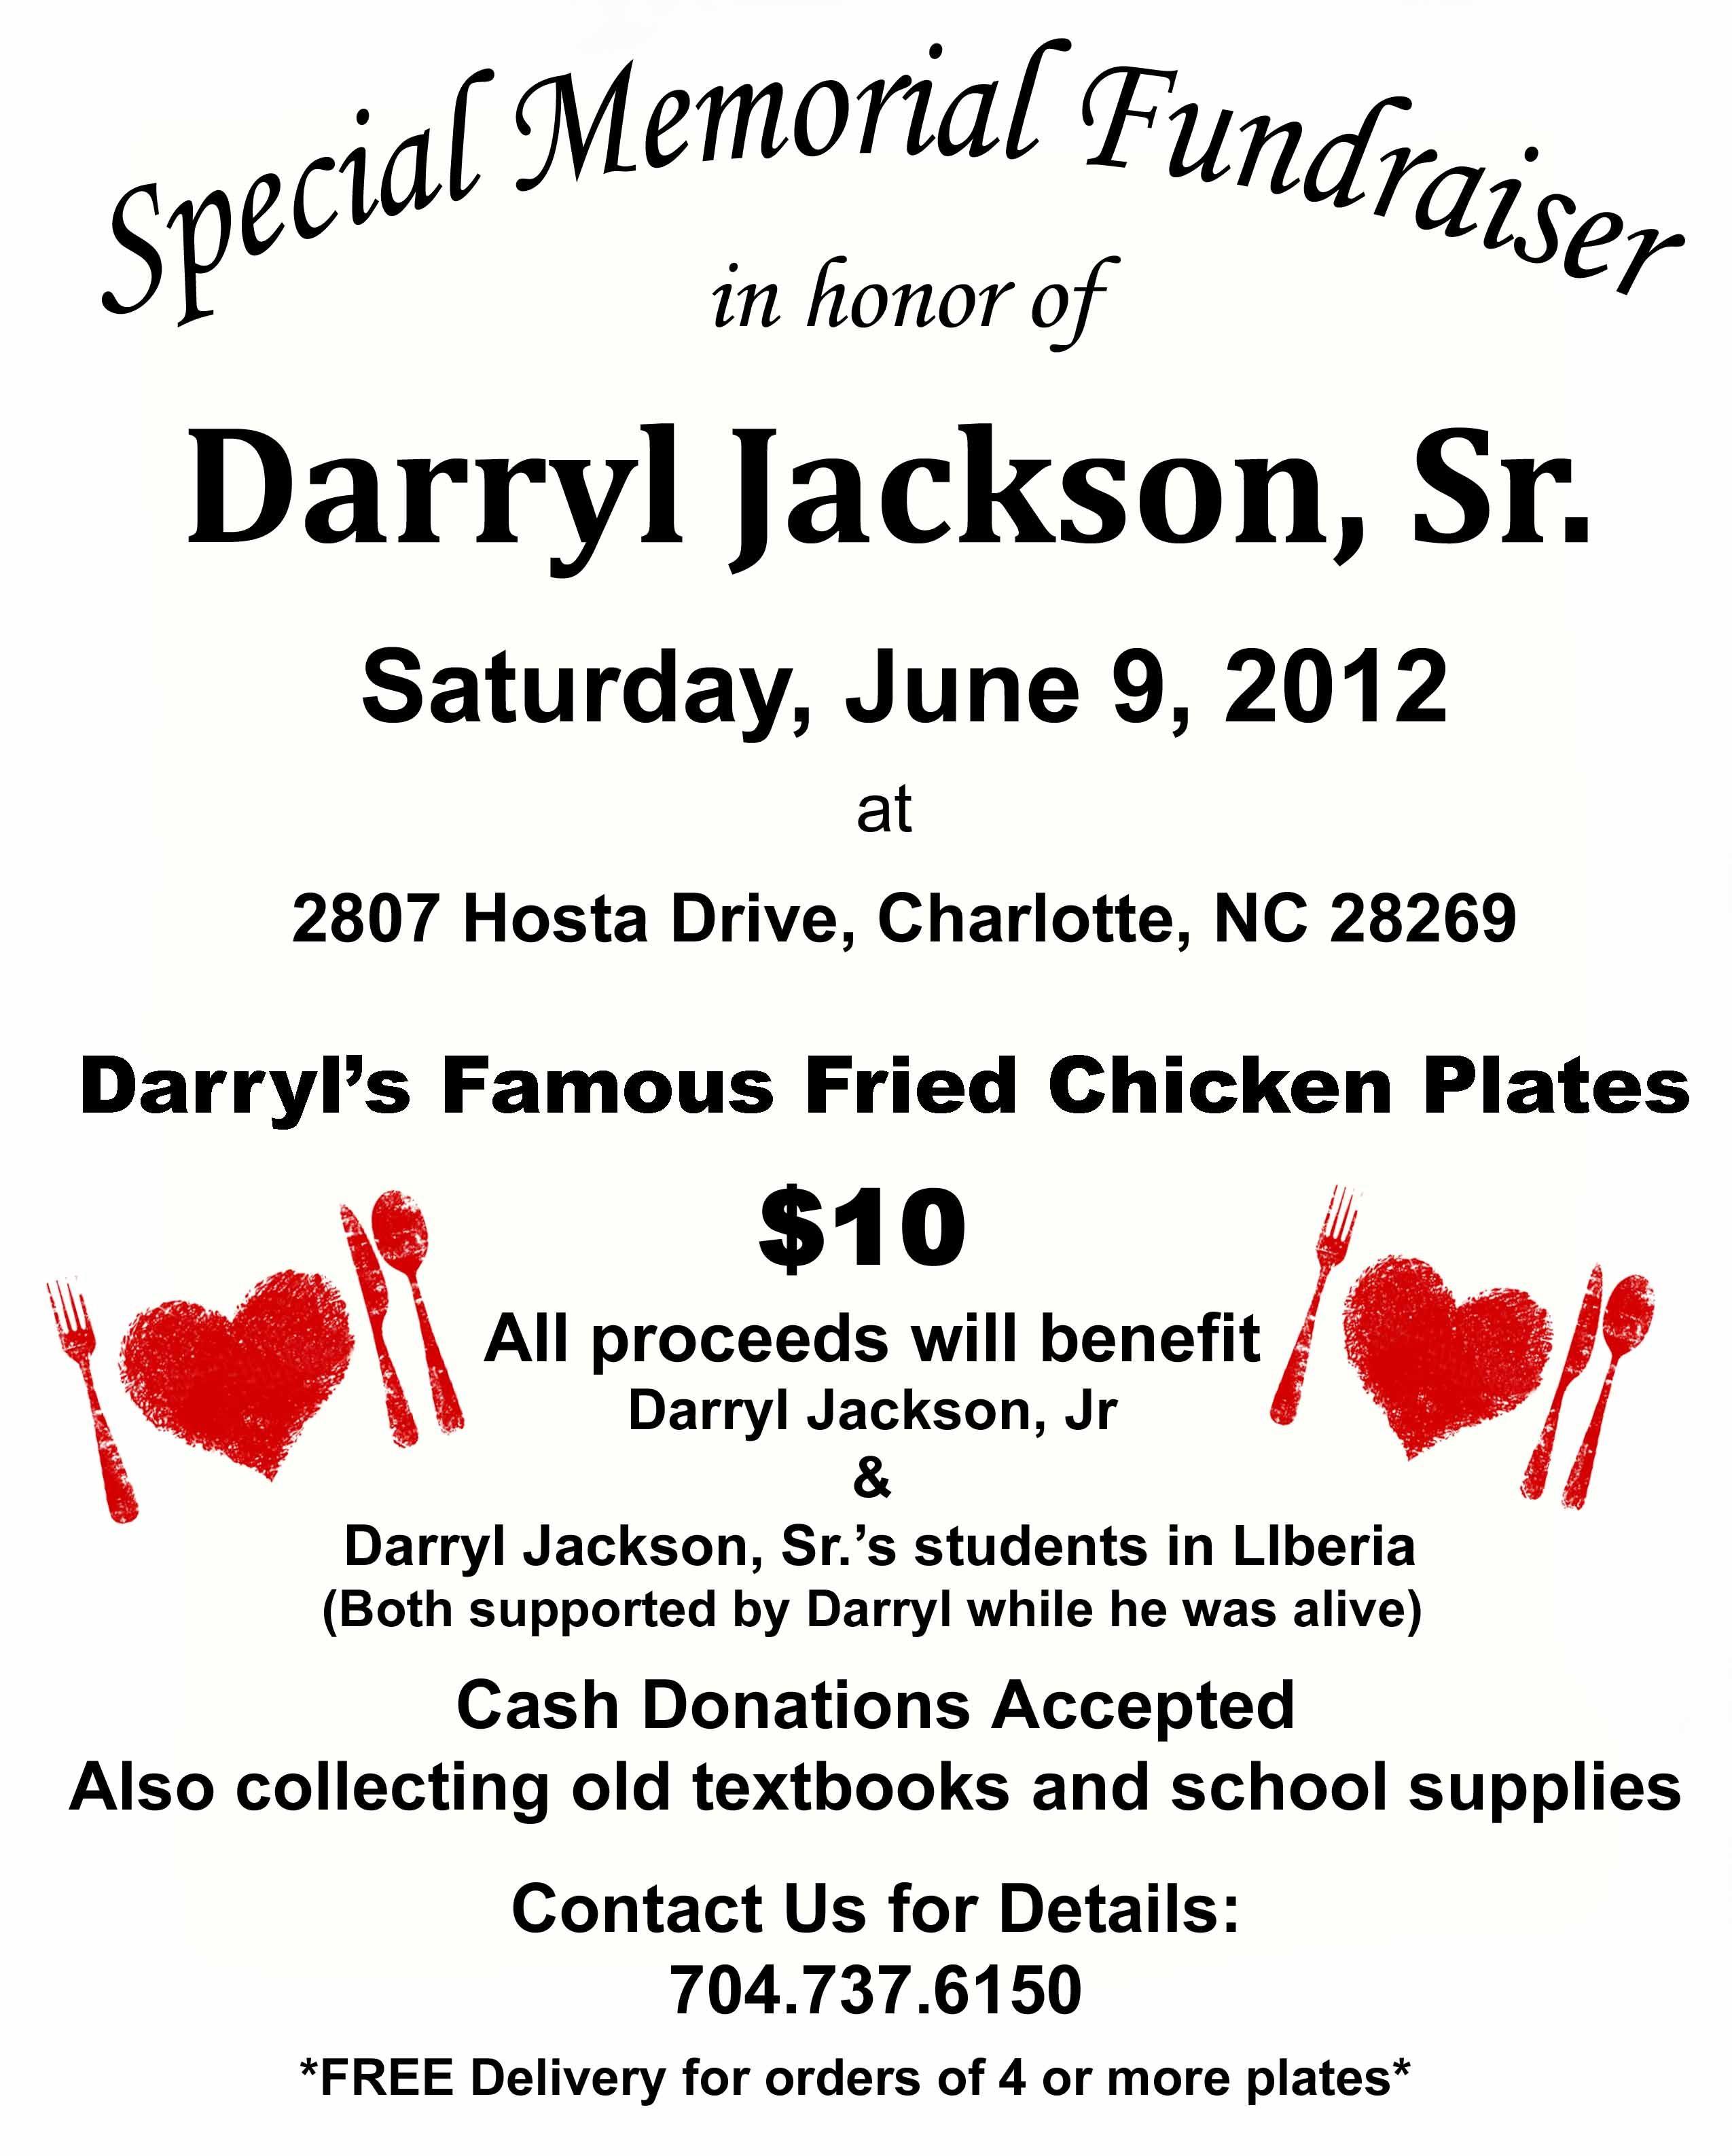 Special Memorial Fundraiser In Honor Of Darryl Jackson Sr For More